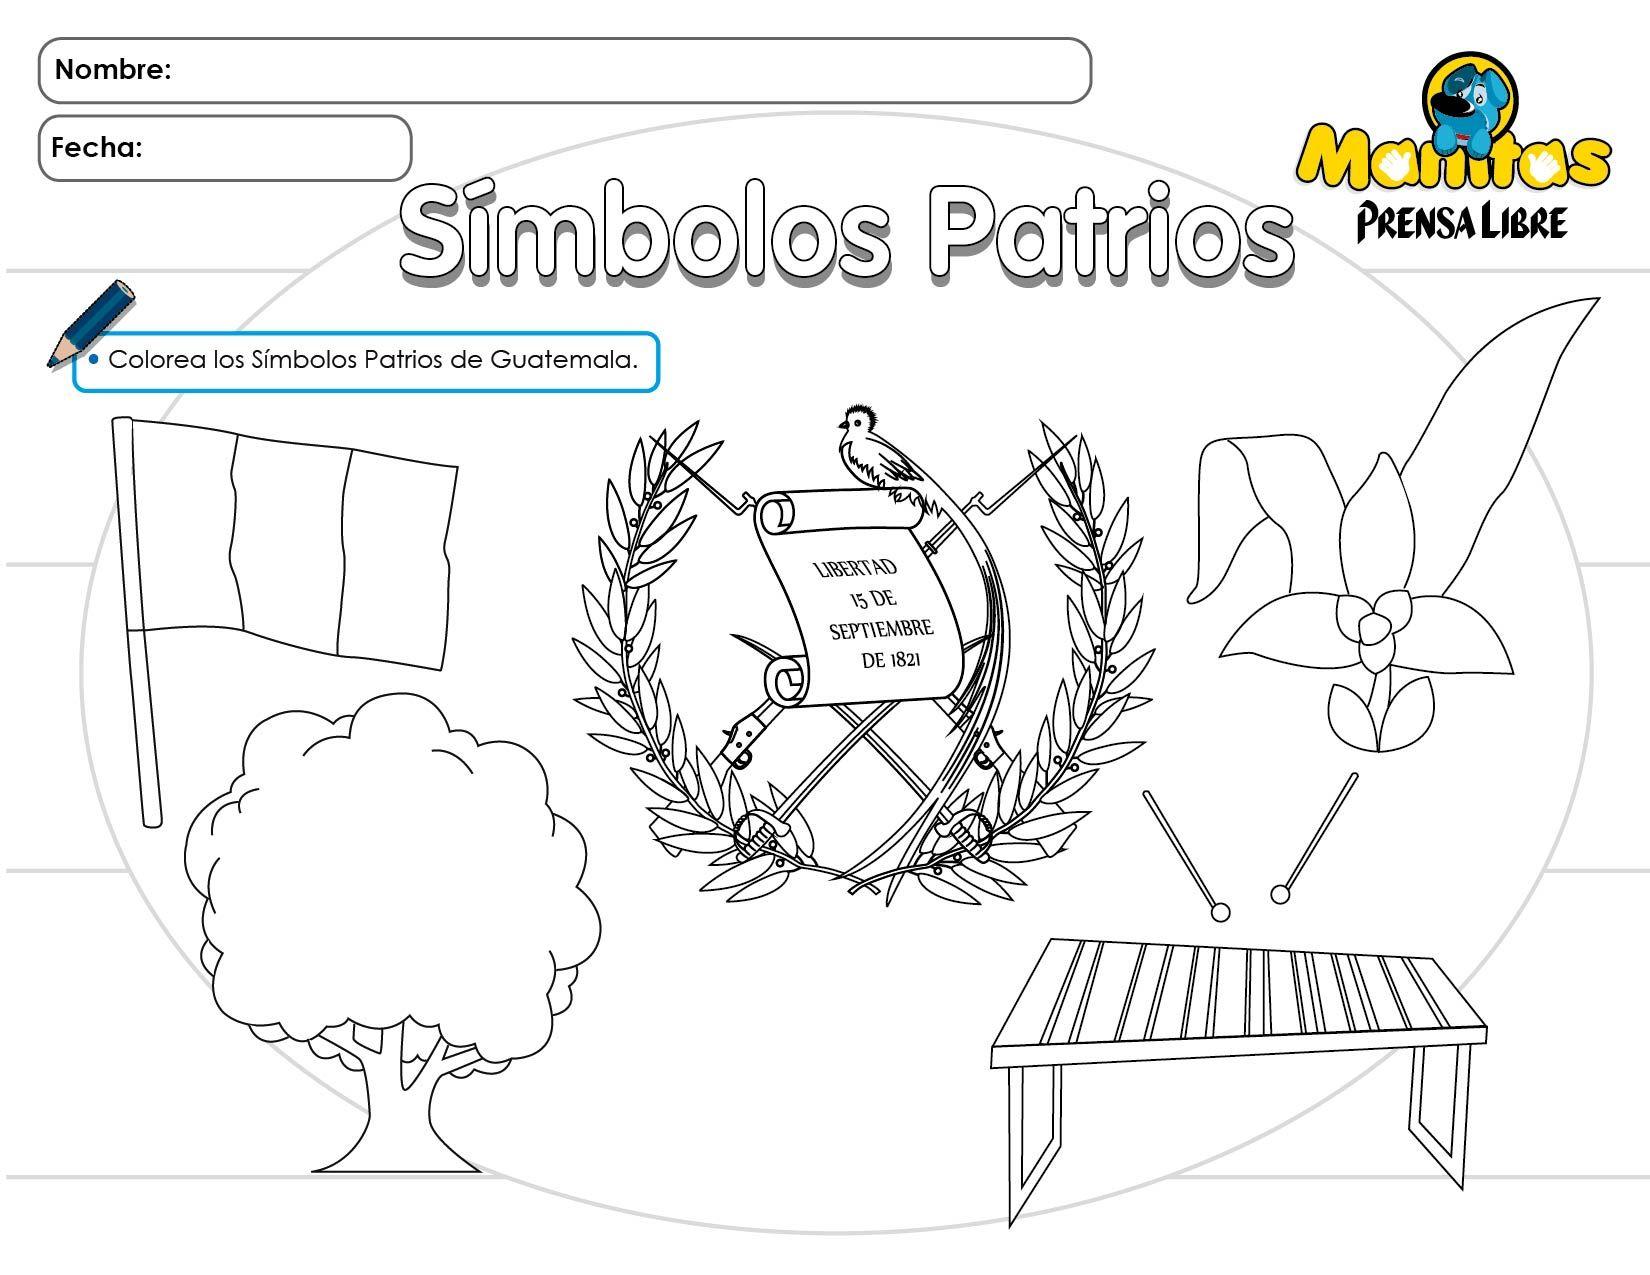 Revista Infantil De Prensa Libre Juegos Y Actividades Para Ni Os Preescolares School Tool Interactive Notebooks Guatemala